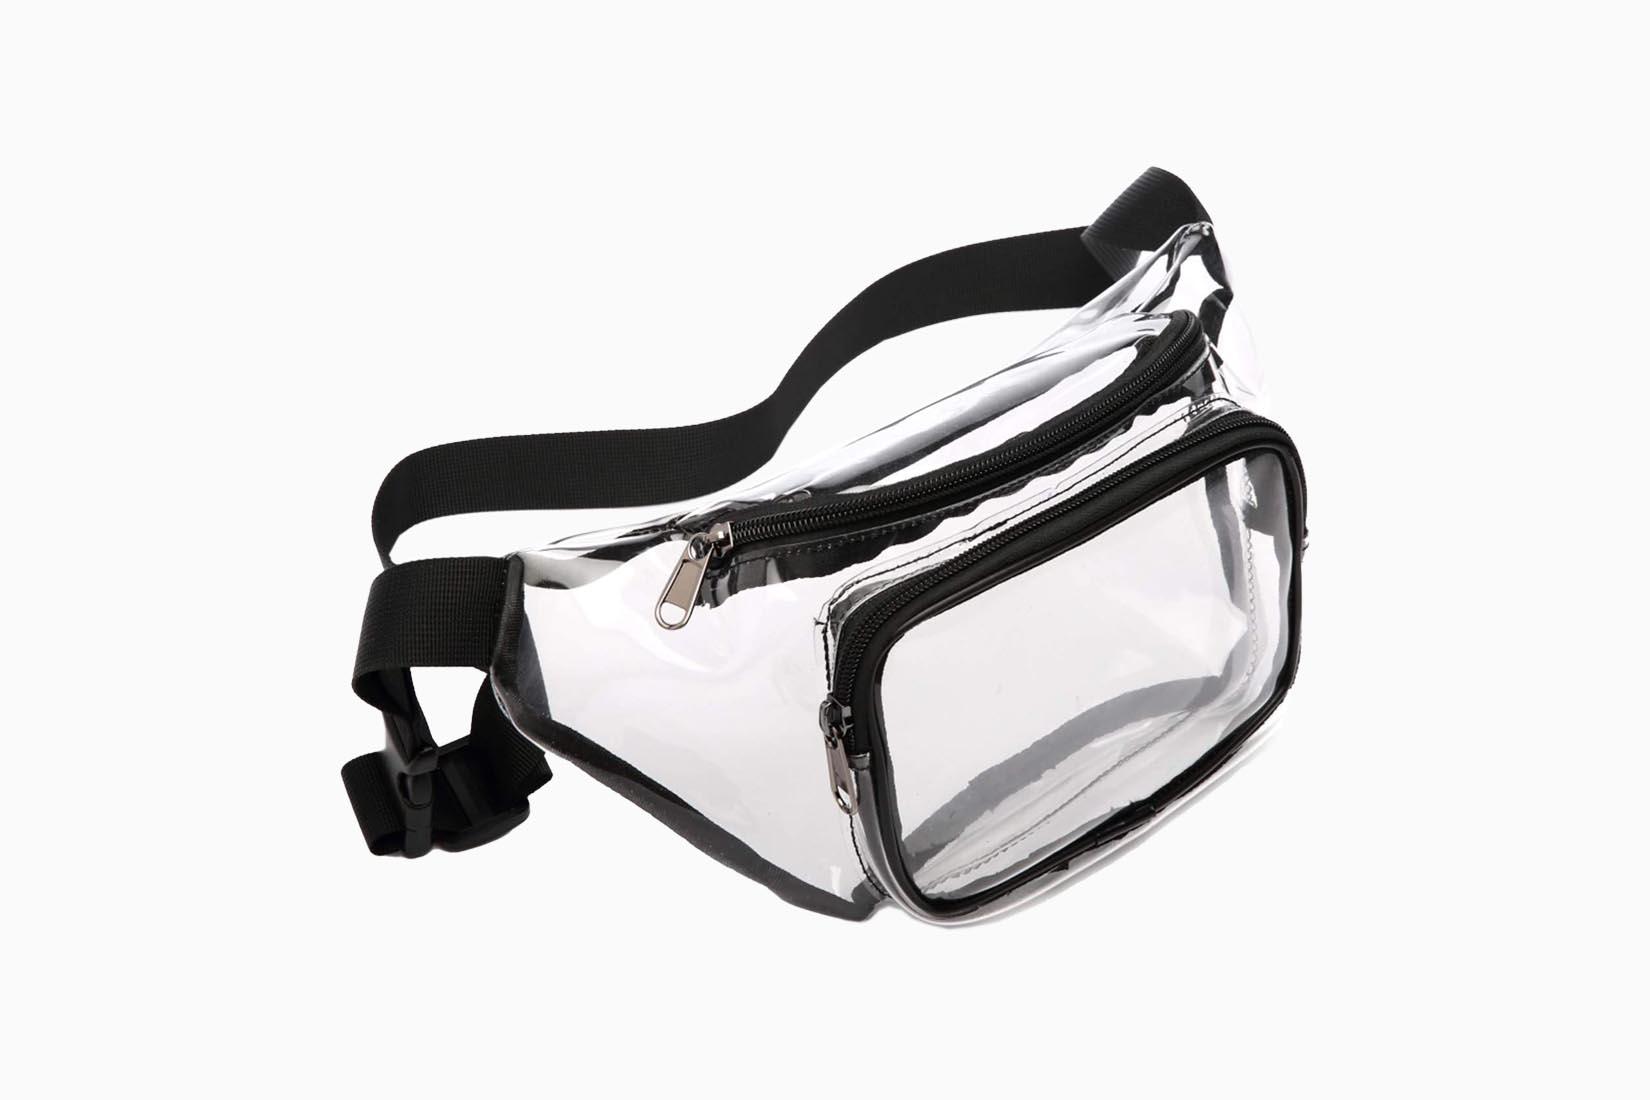 best belt bags women Veckle review Luxe Digital